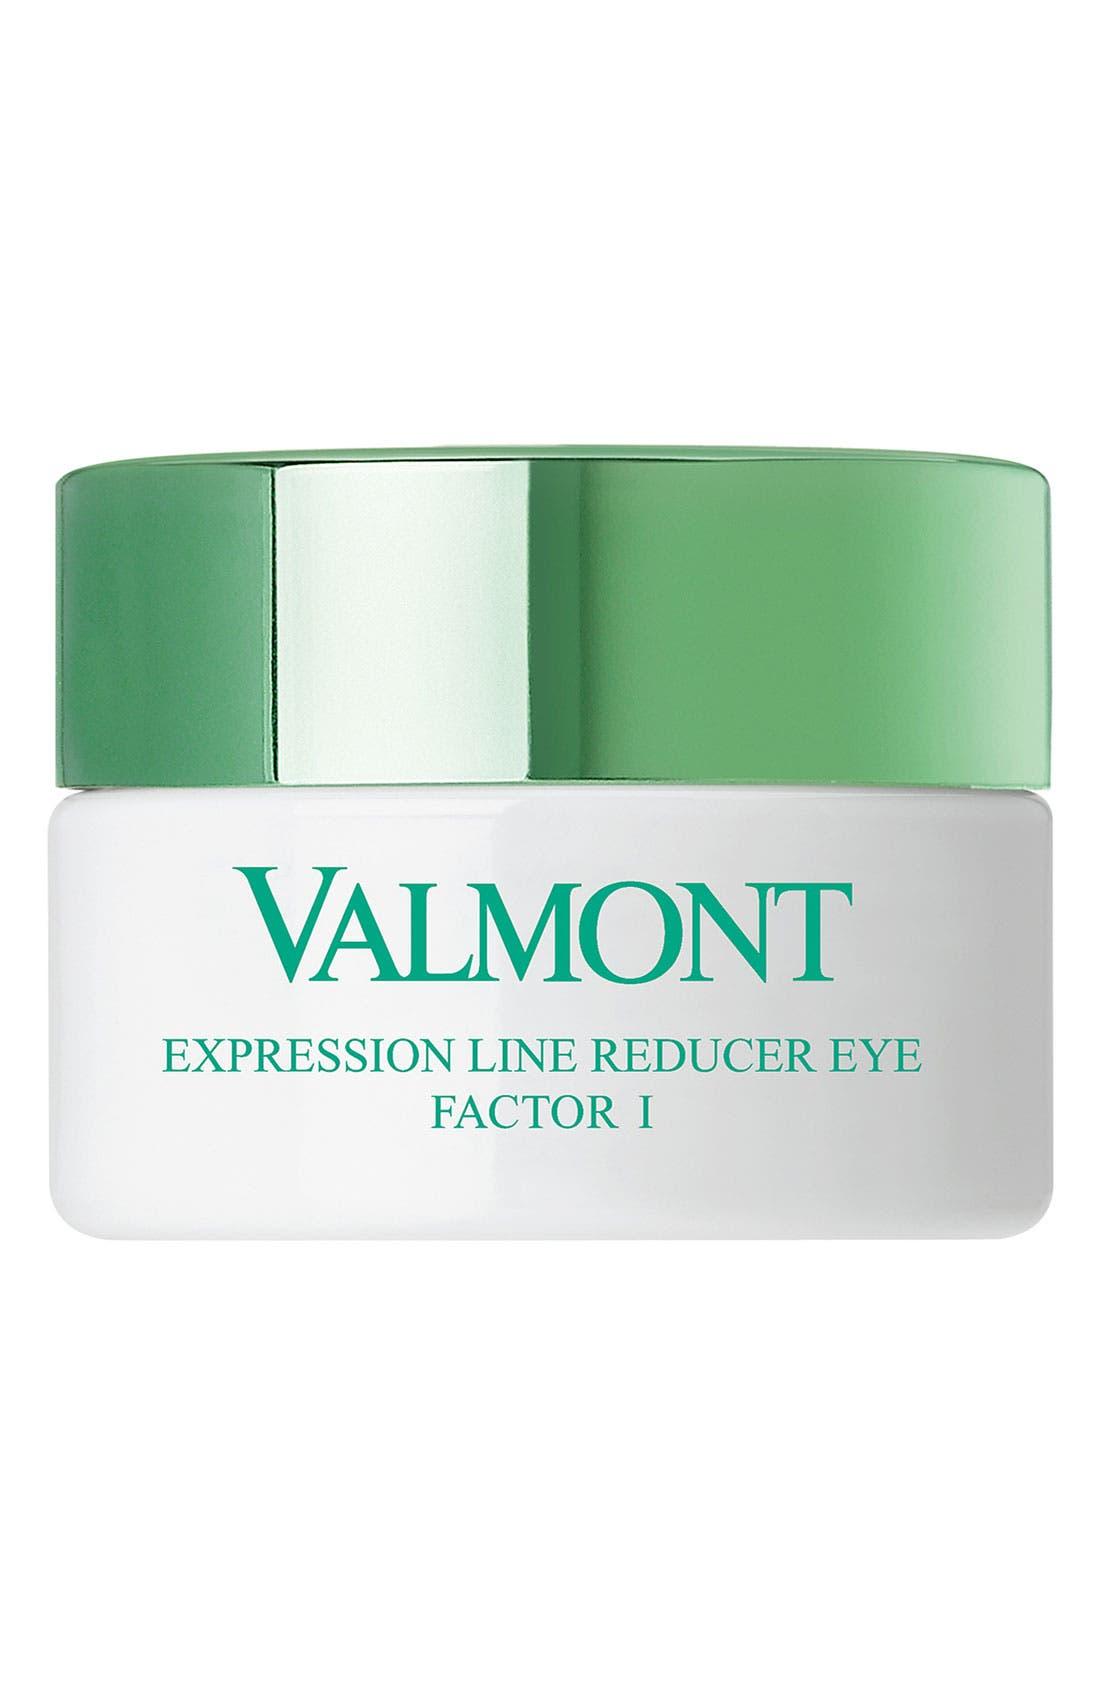 Valmont 'Expression Line Reducer Eye Factor I' Cream